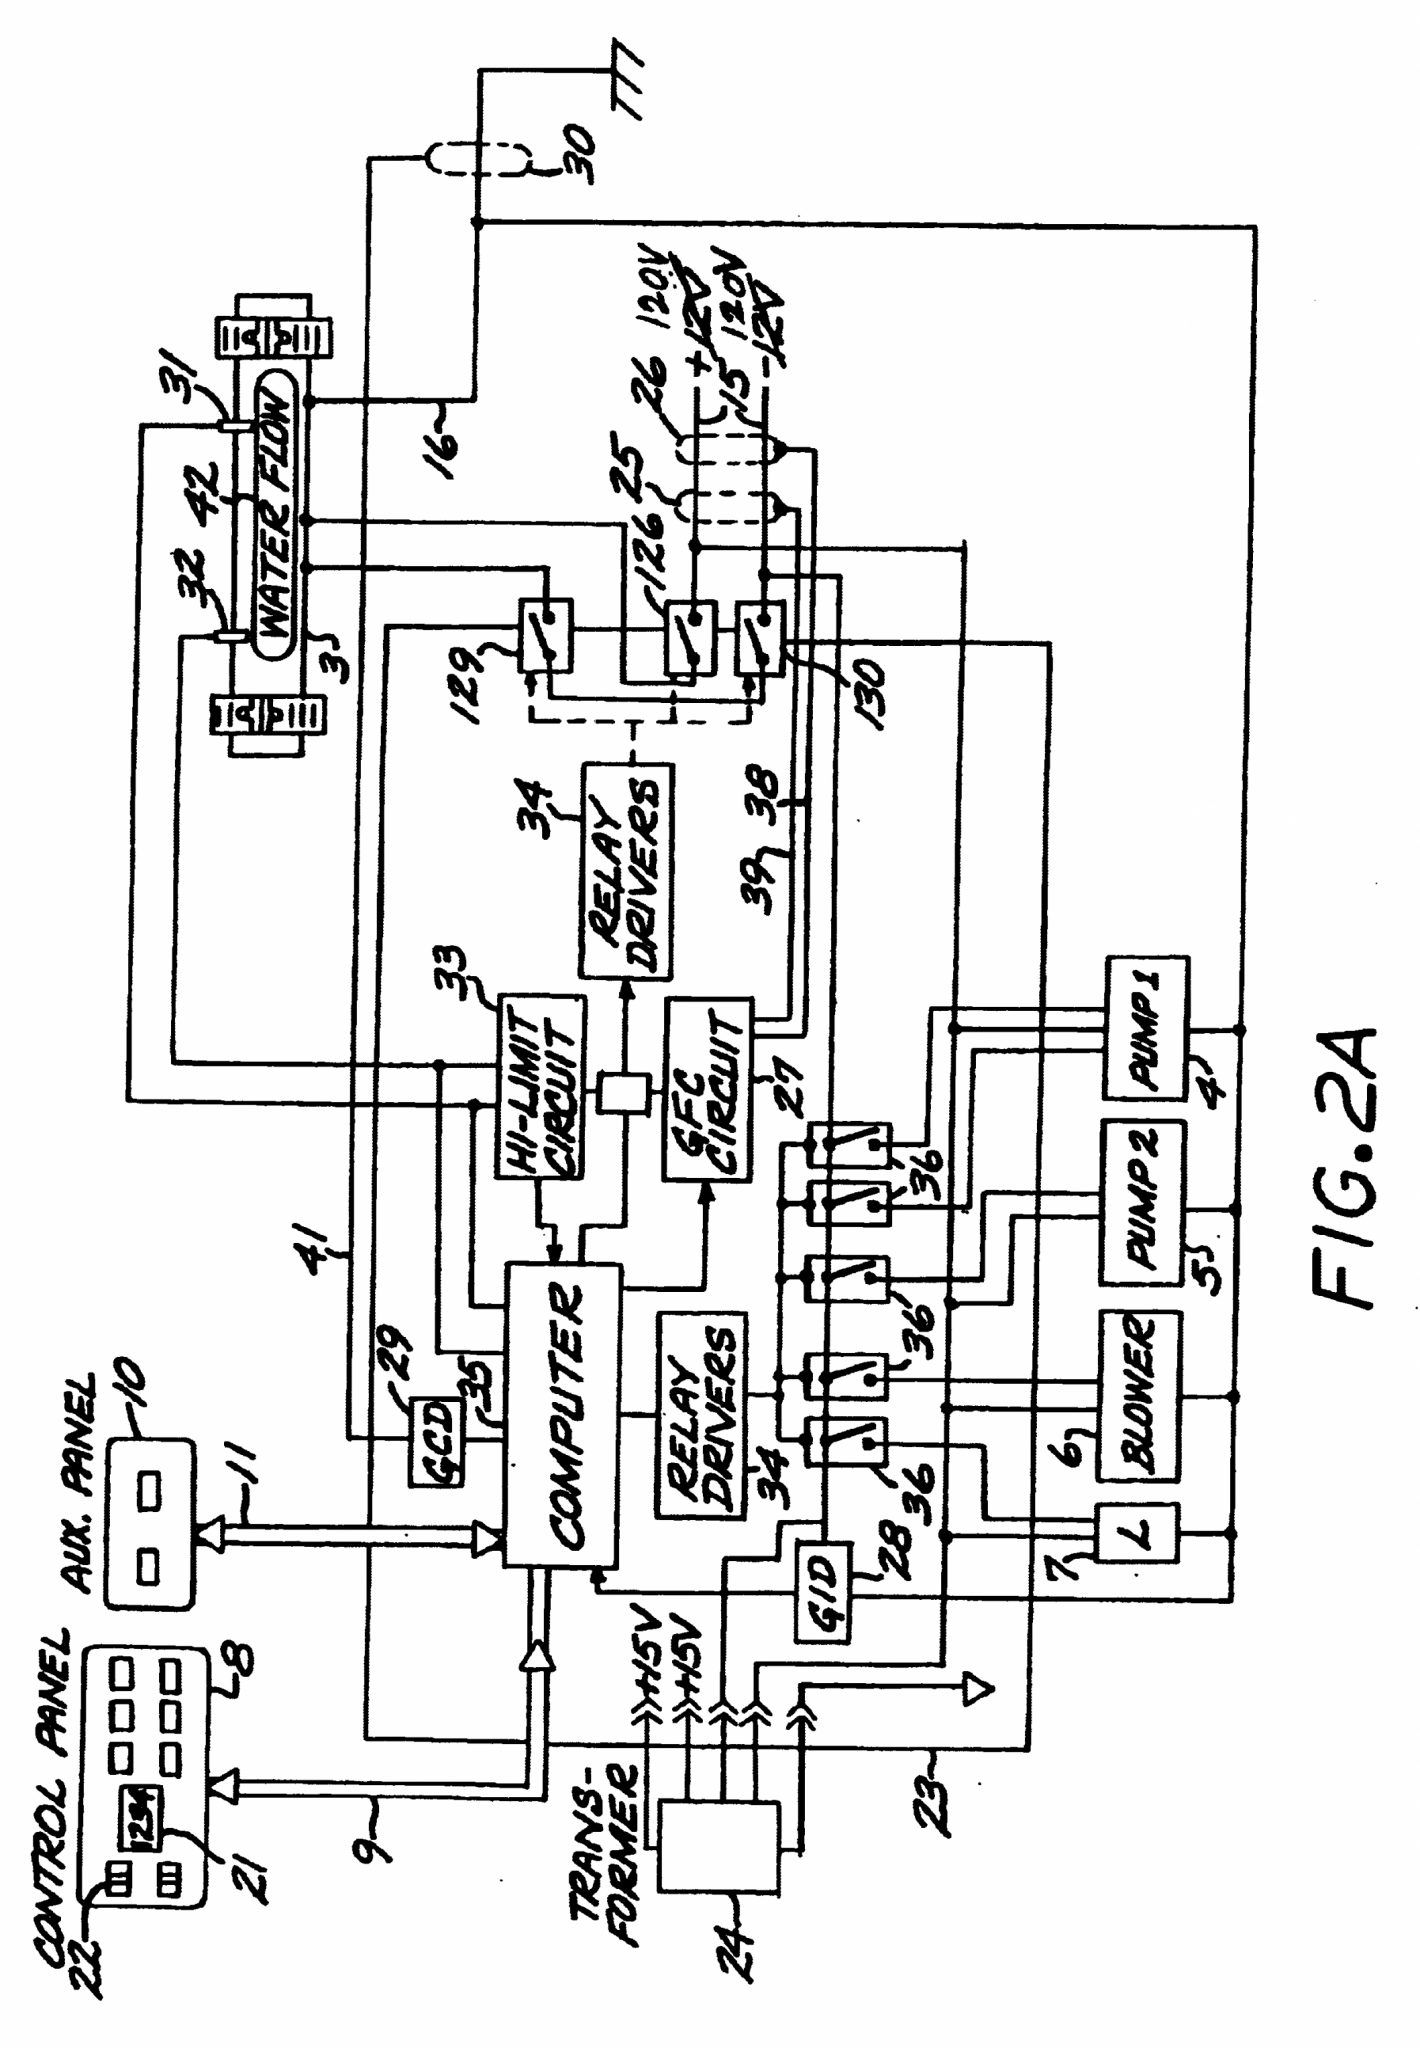 hight resolution of square d well pump pressure switch wiring diagram rh pinterest cl duplex pump control panel wiring diagram start stop station wiring diagram